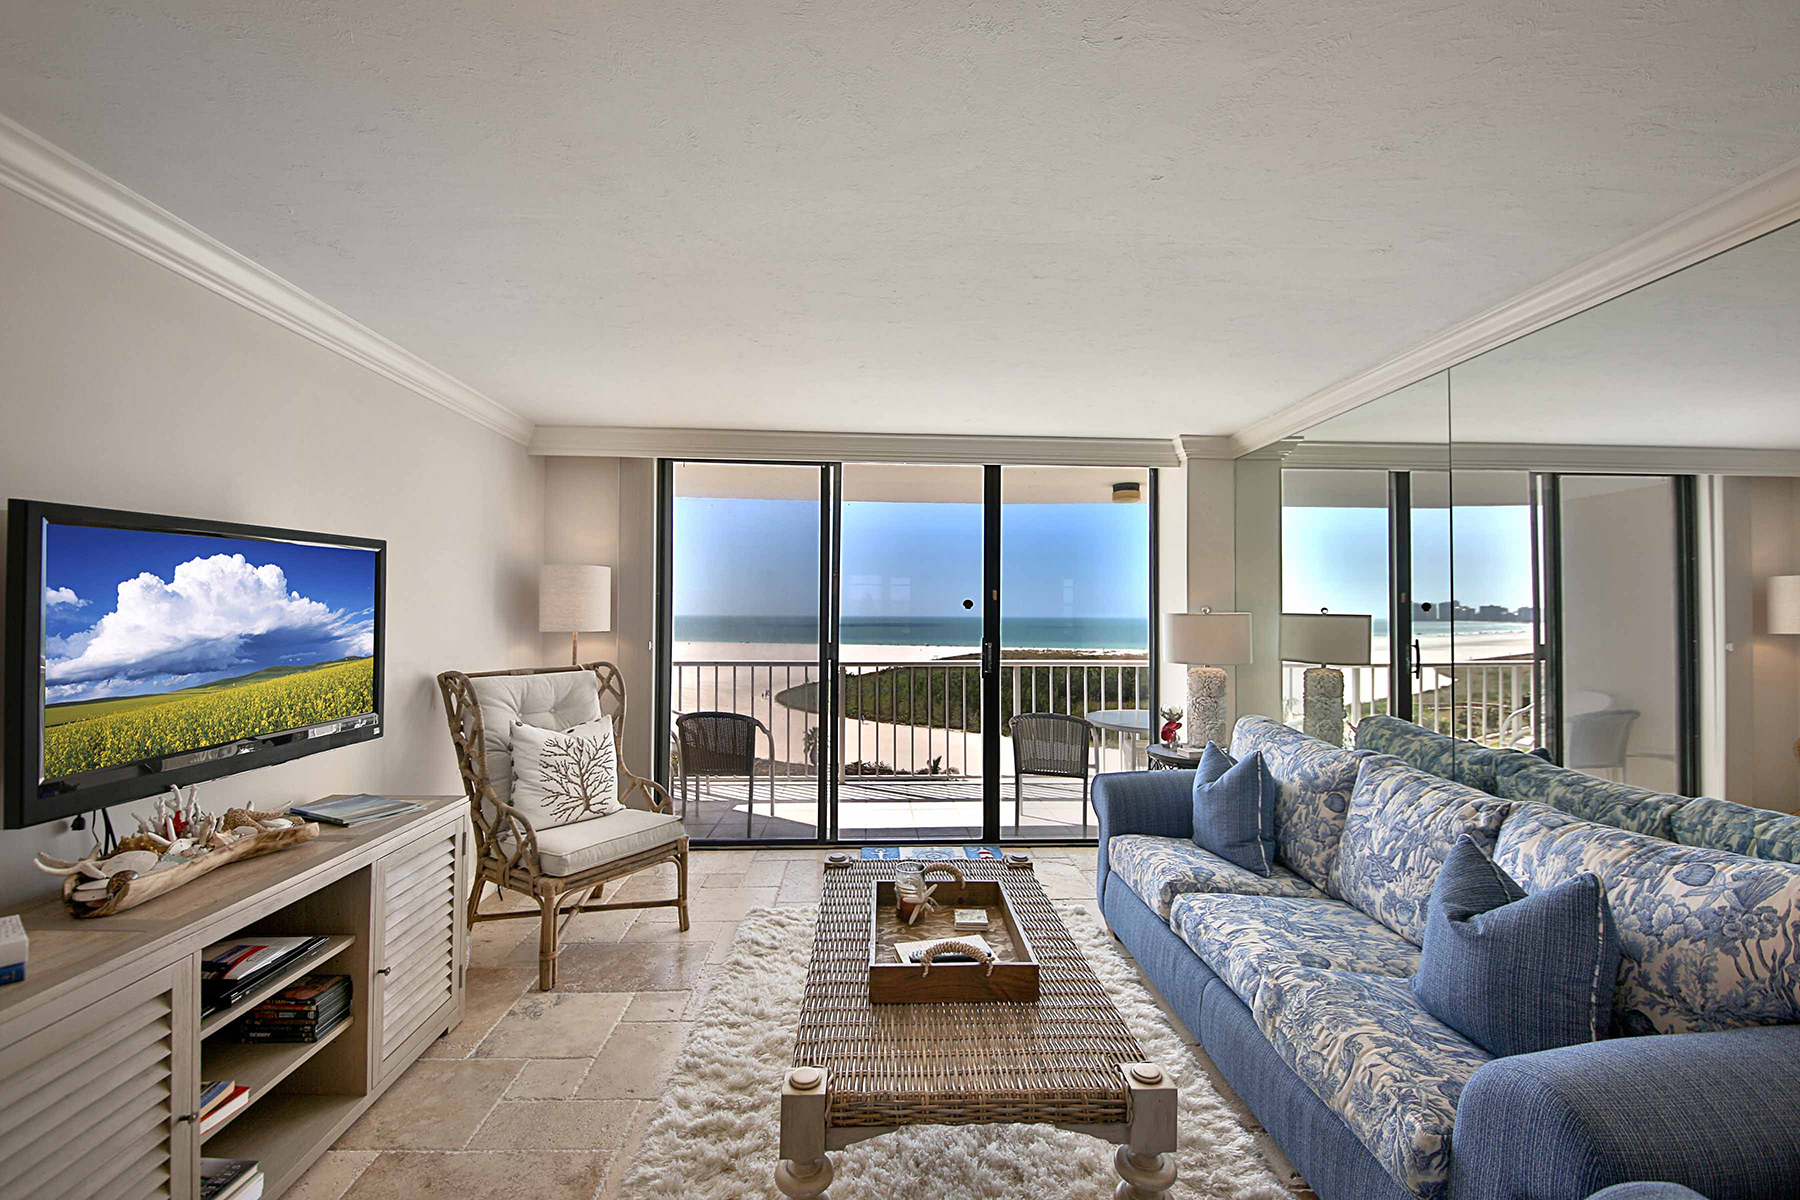 Condominium for Rent at MARCO ISLAND - SOUTH SEAS NORTHWEST 380 Seaview Ct 805, Marco Island, Florida 34145 United States